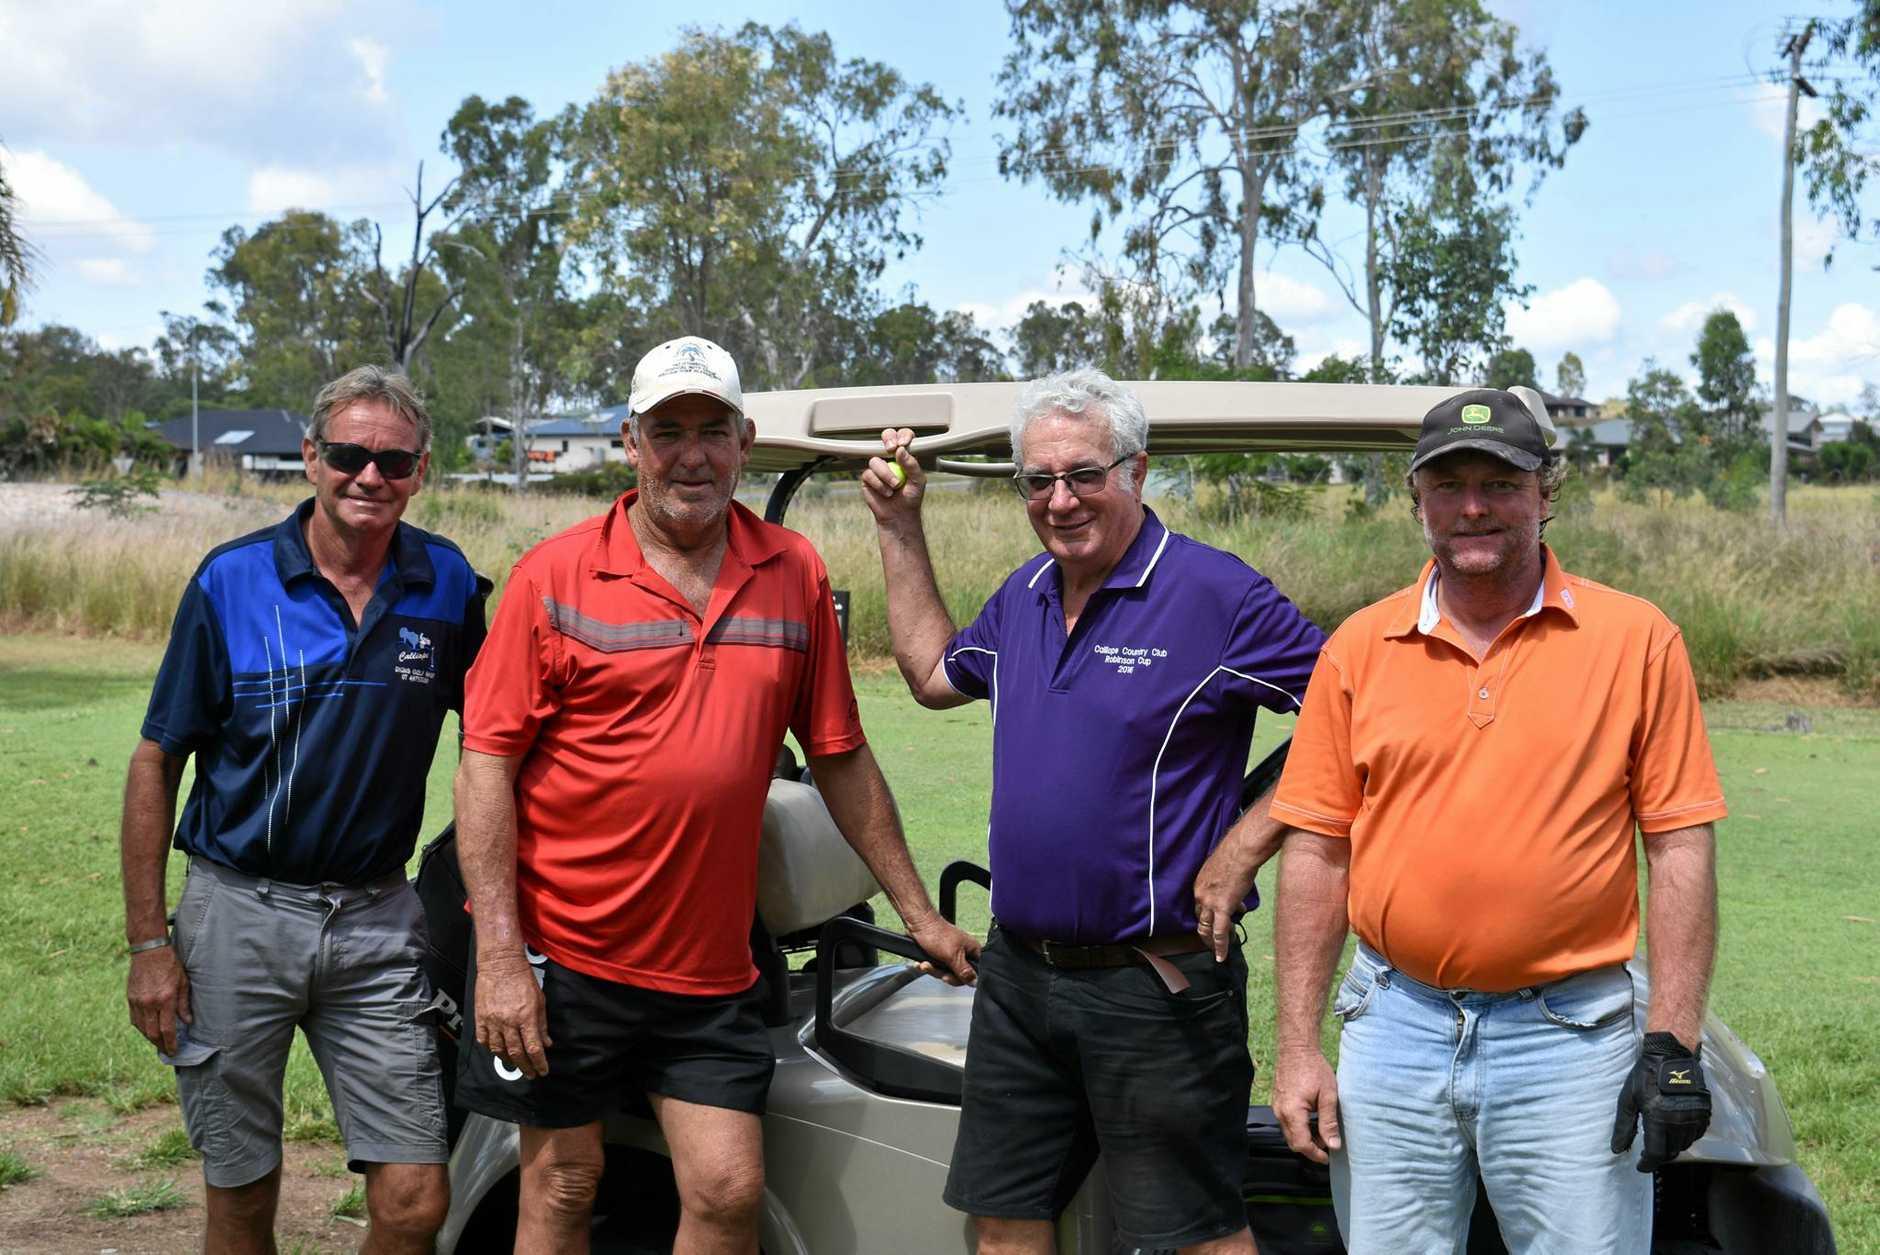 Mark Jones, Brett Rideout, Graeme Johnson and Steven Cruwys.